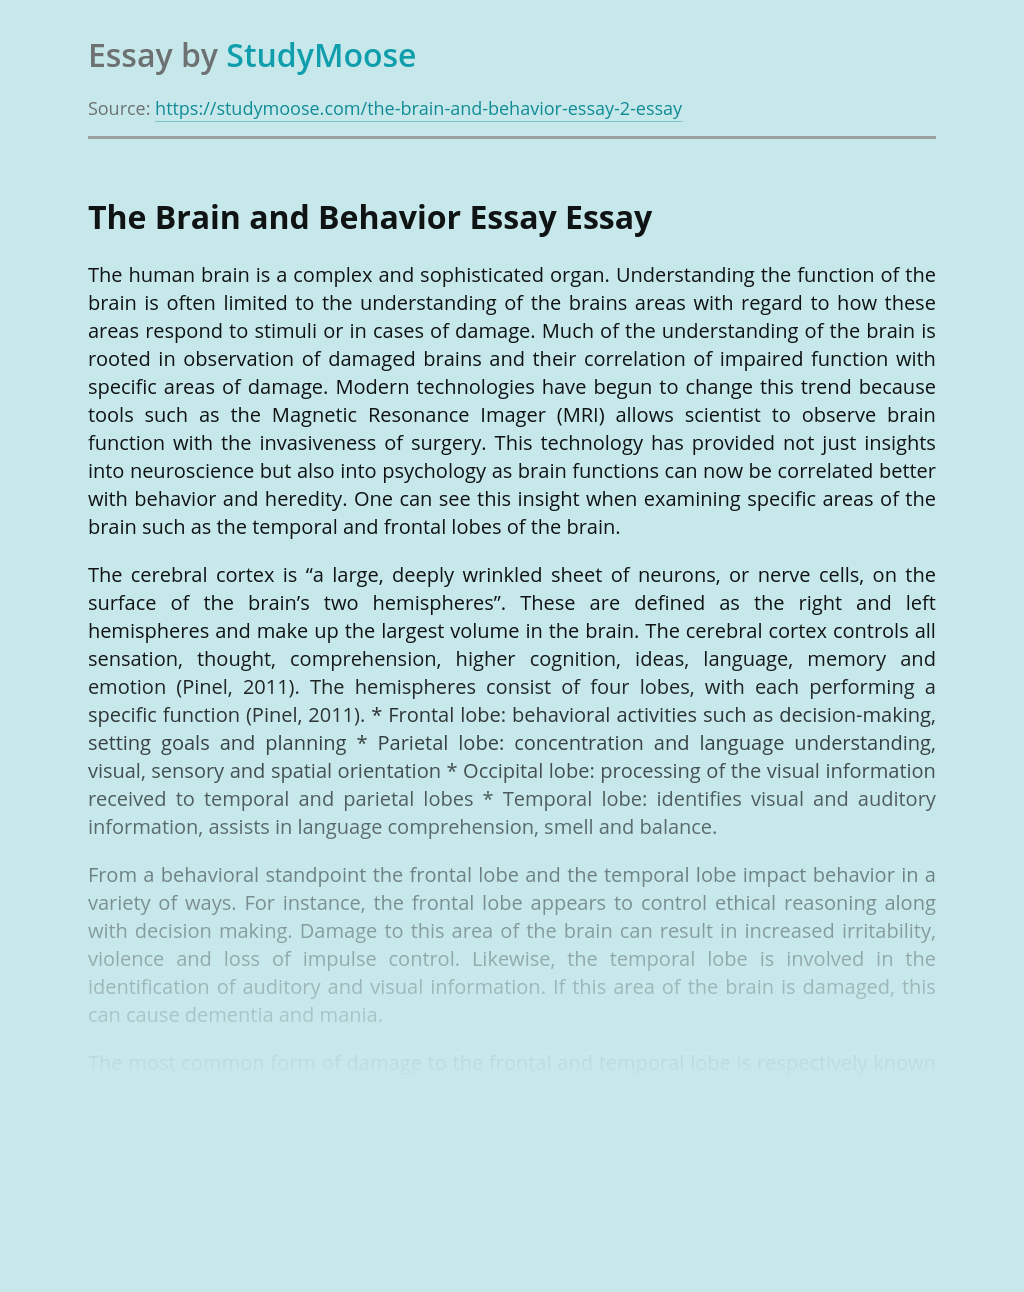 The Brain and Behavior Essay